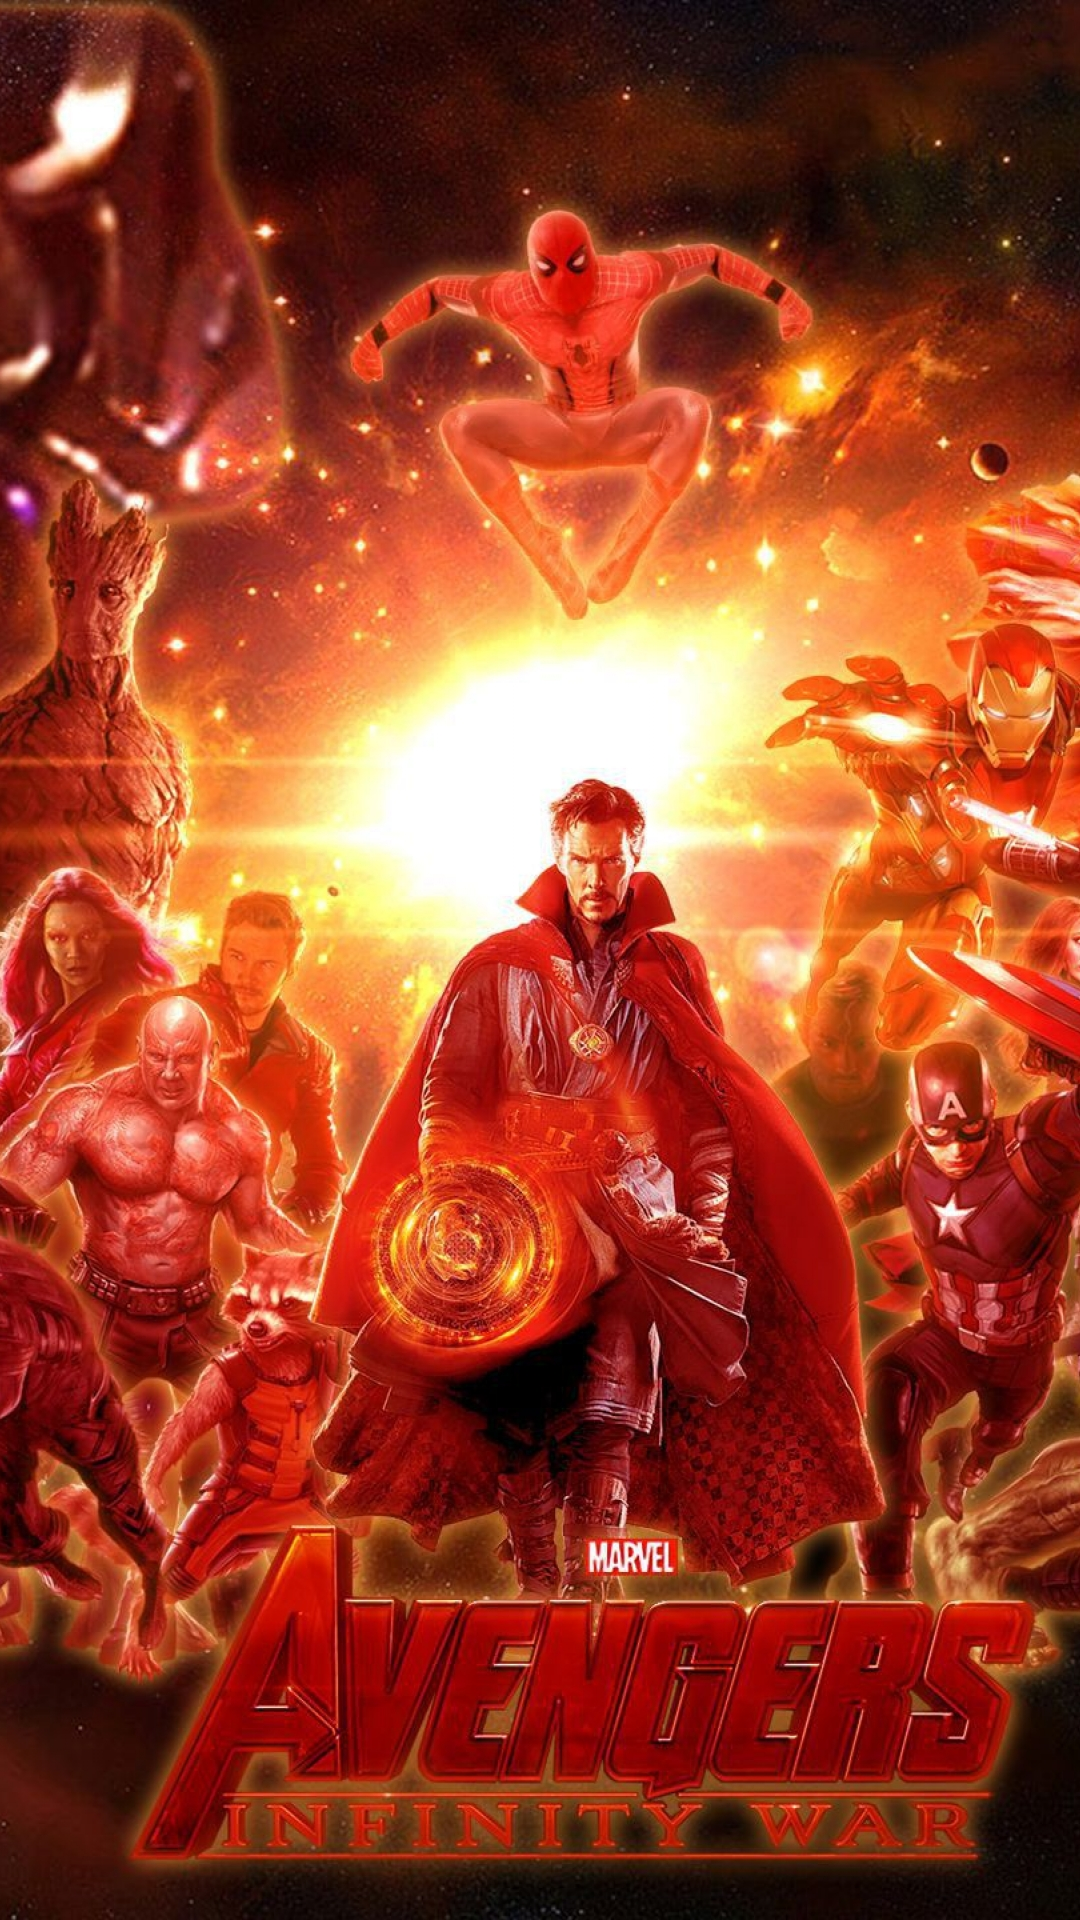 Marvel Avengers Infinity War Wallpaper Download High